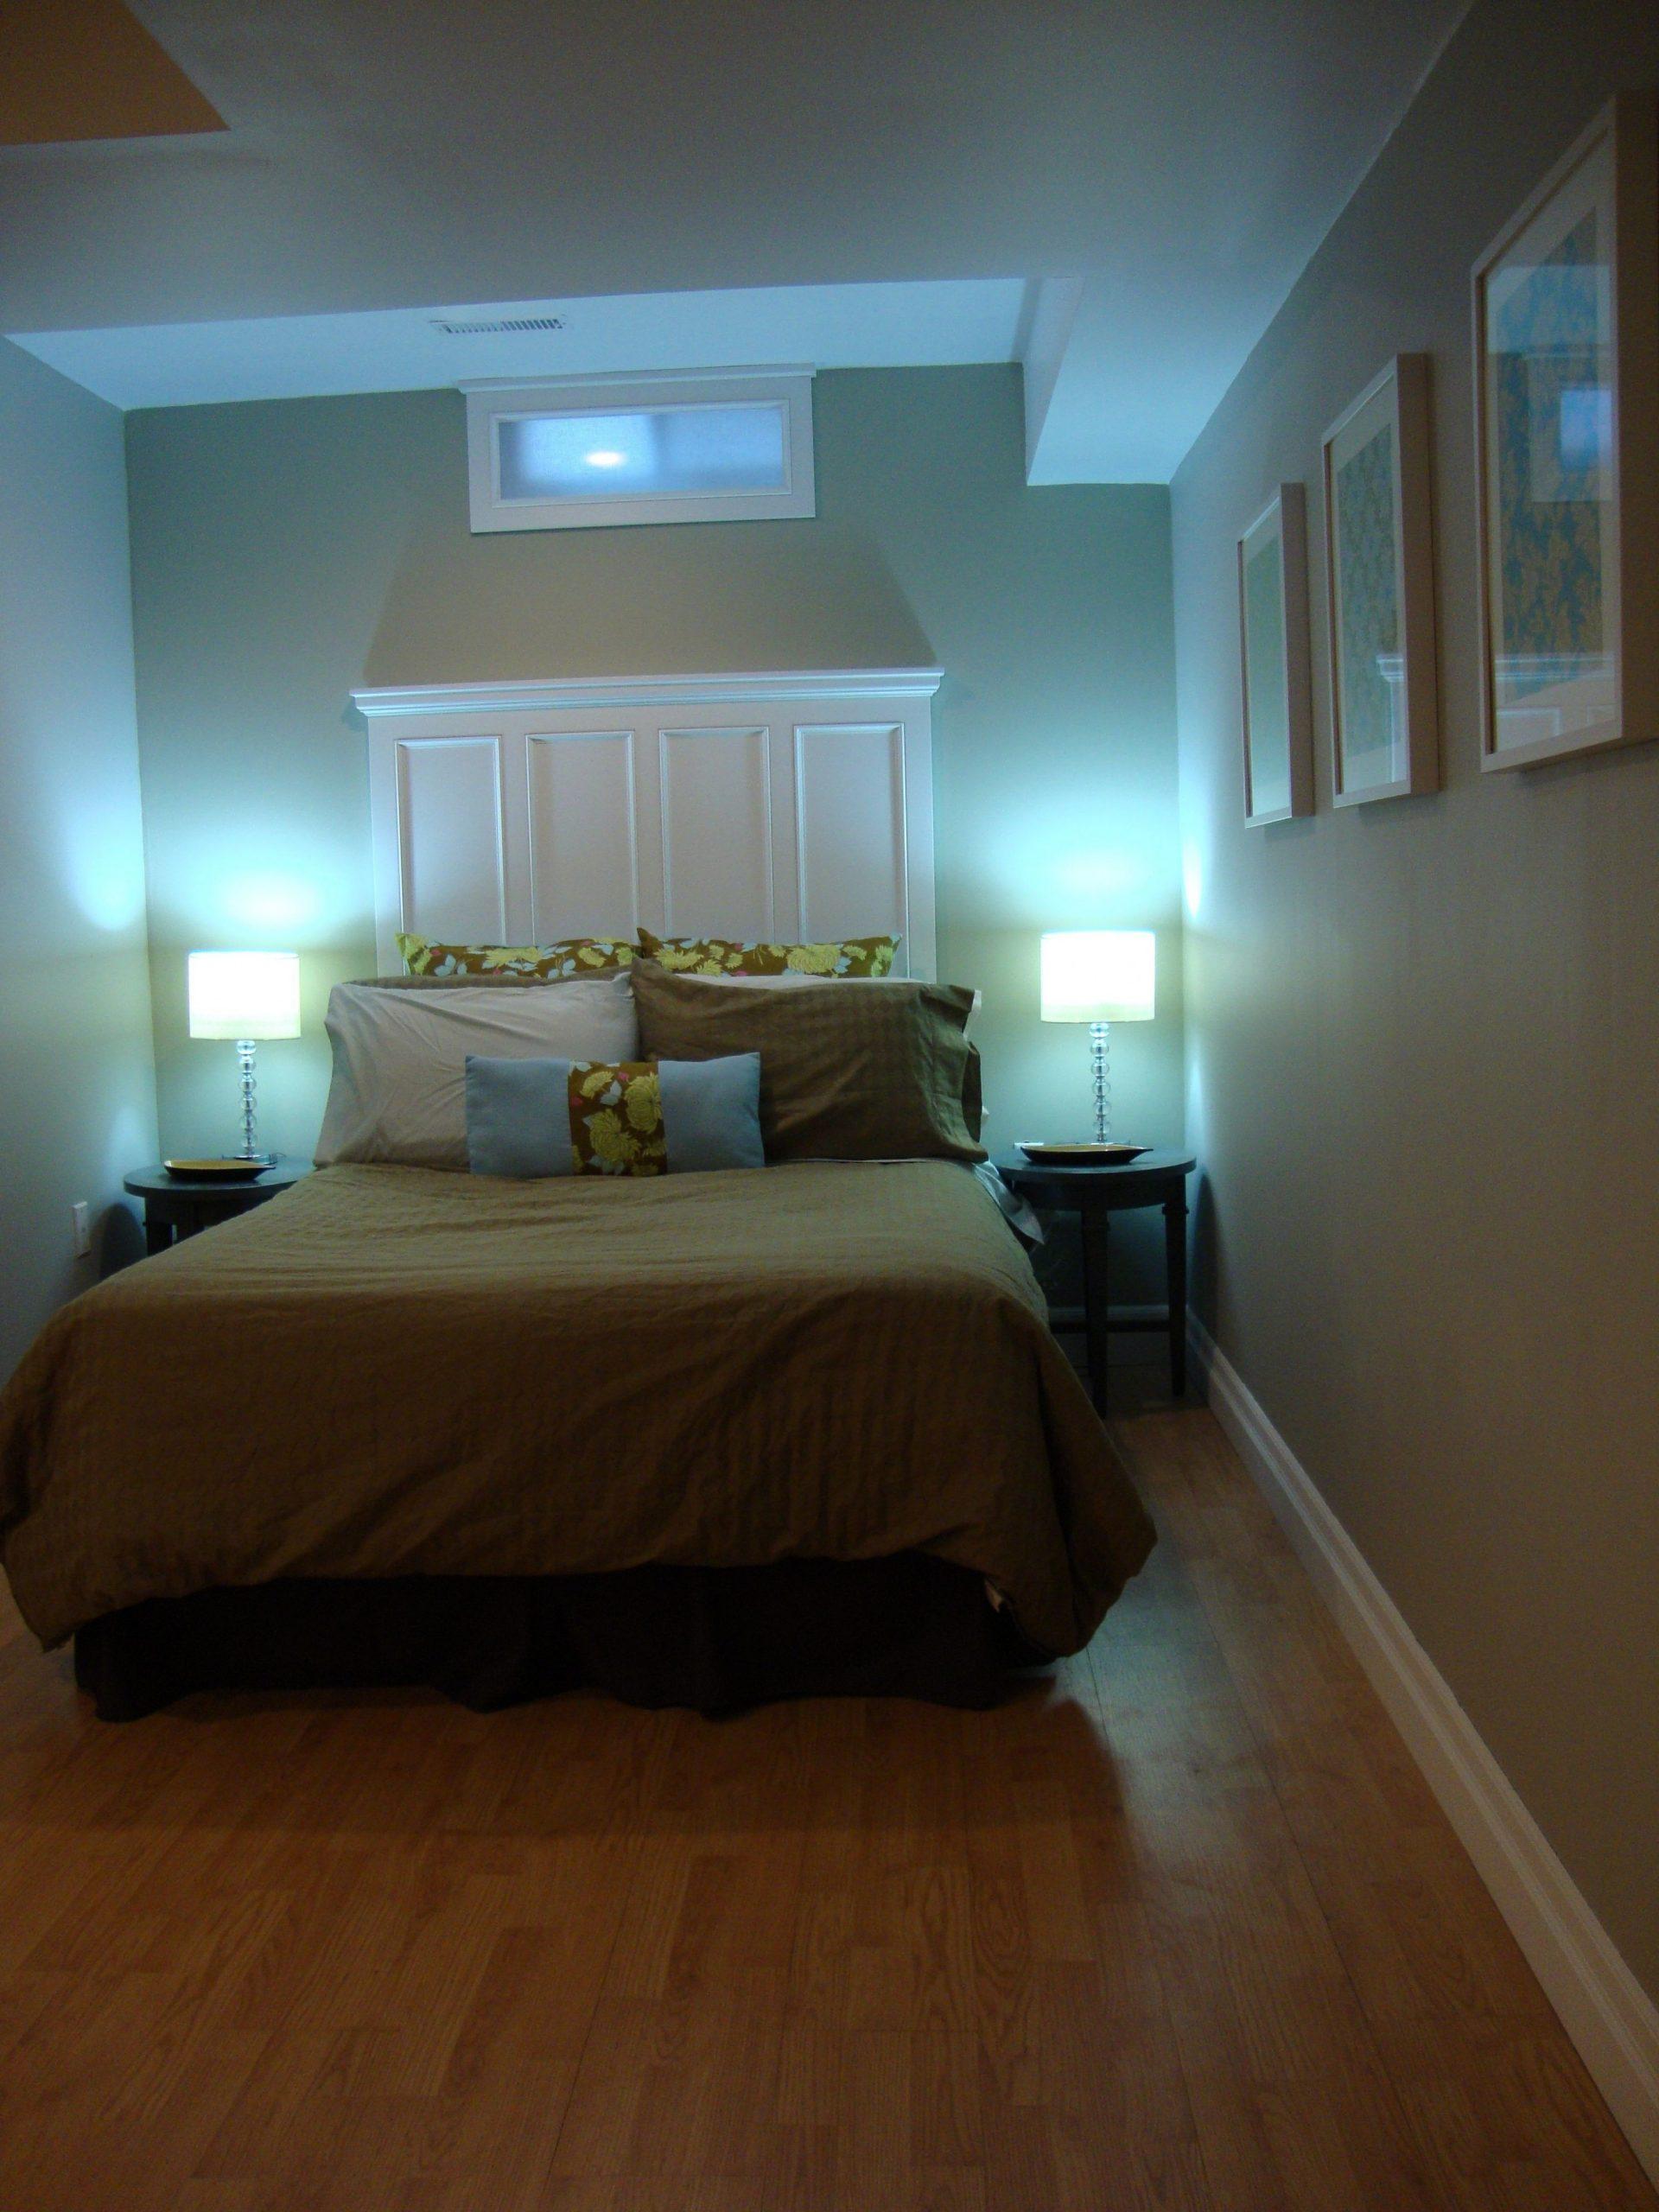 Bedroom Ideas No Windows in 11  Basement master bedroom, Master  - Bedroom Ideas No Windows